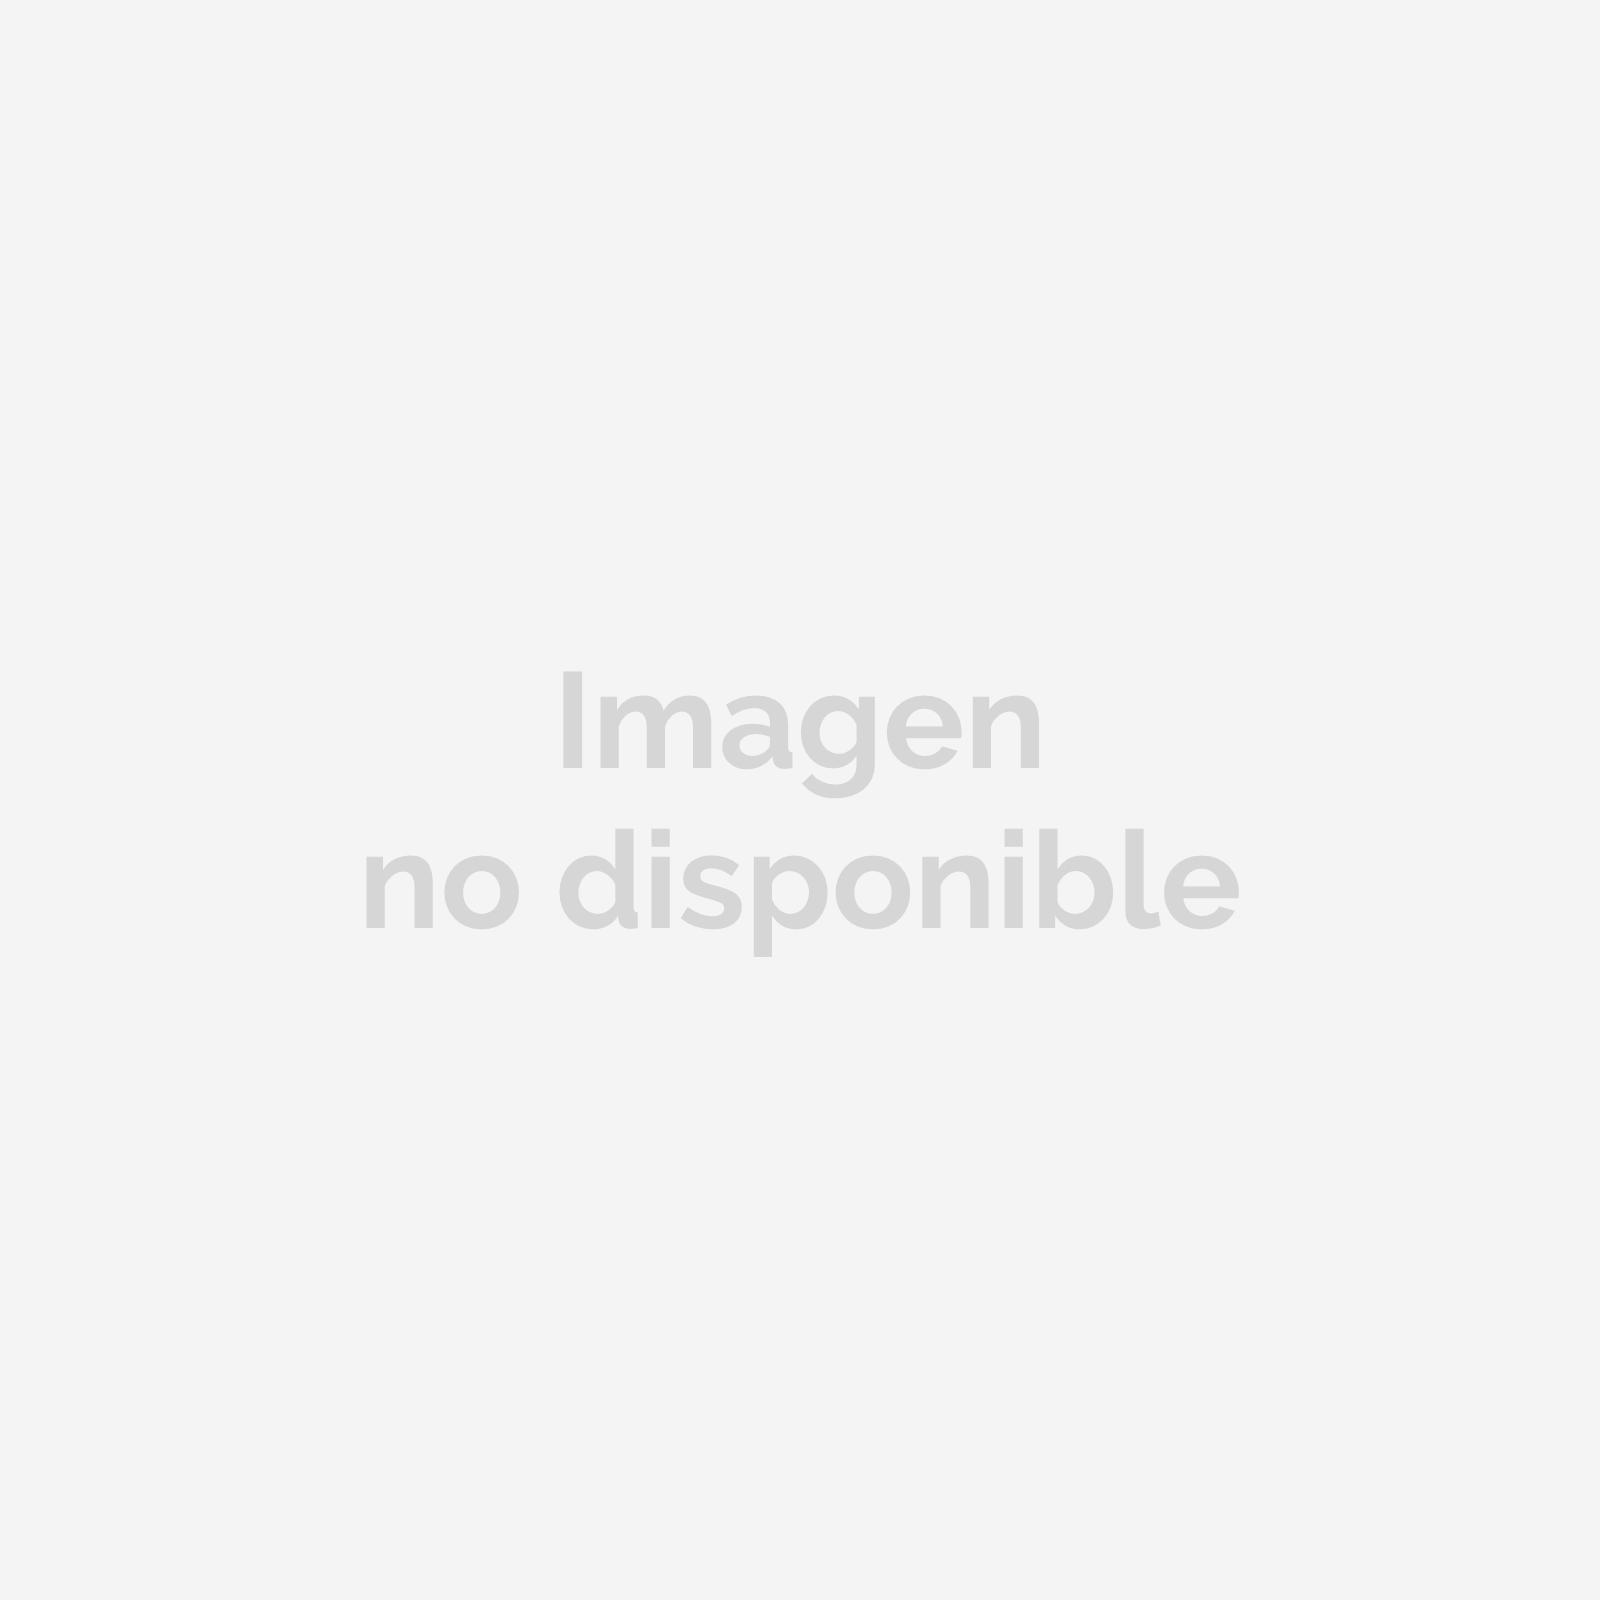 Funda Protectora Para Vestido Transparente